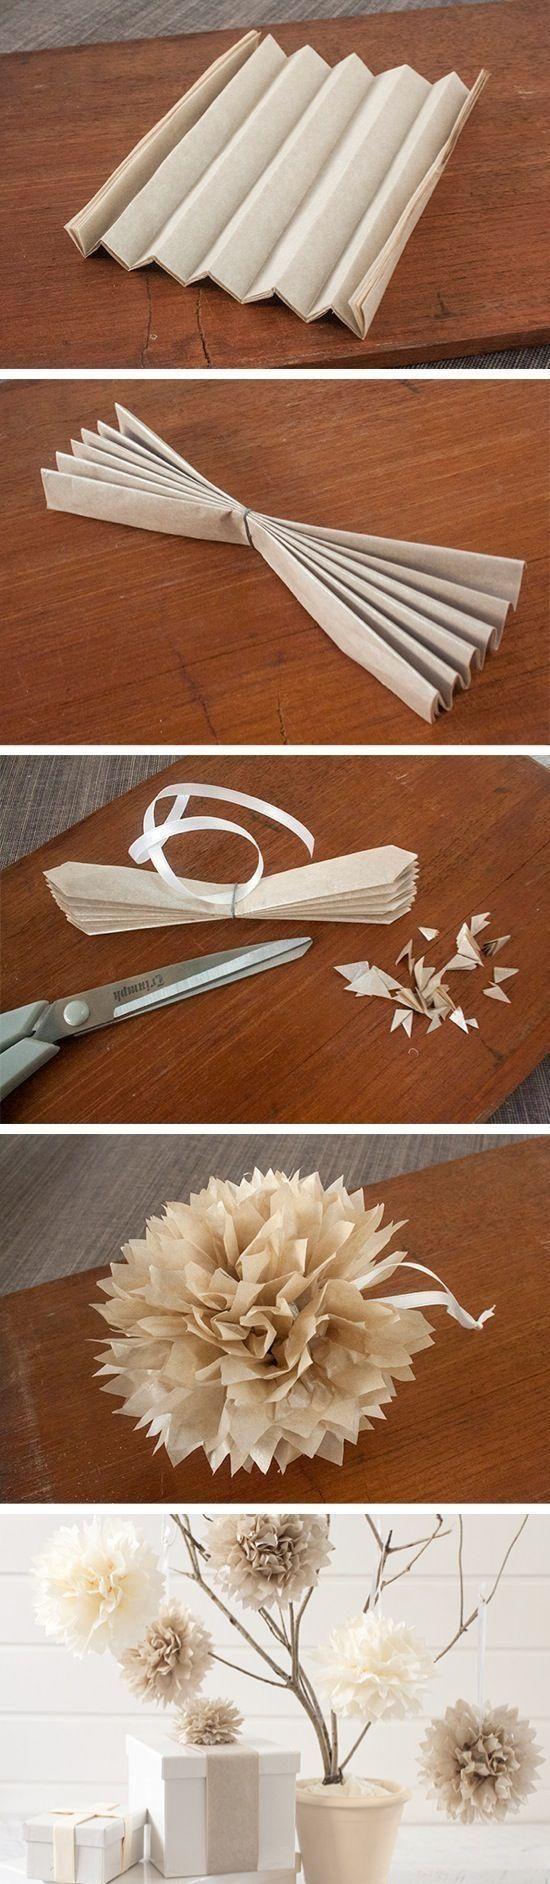 DIY - Wedding DIY #2074016 - Weddbook (Diy Ornaments Tree)